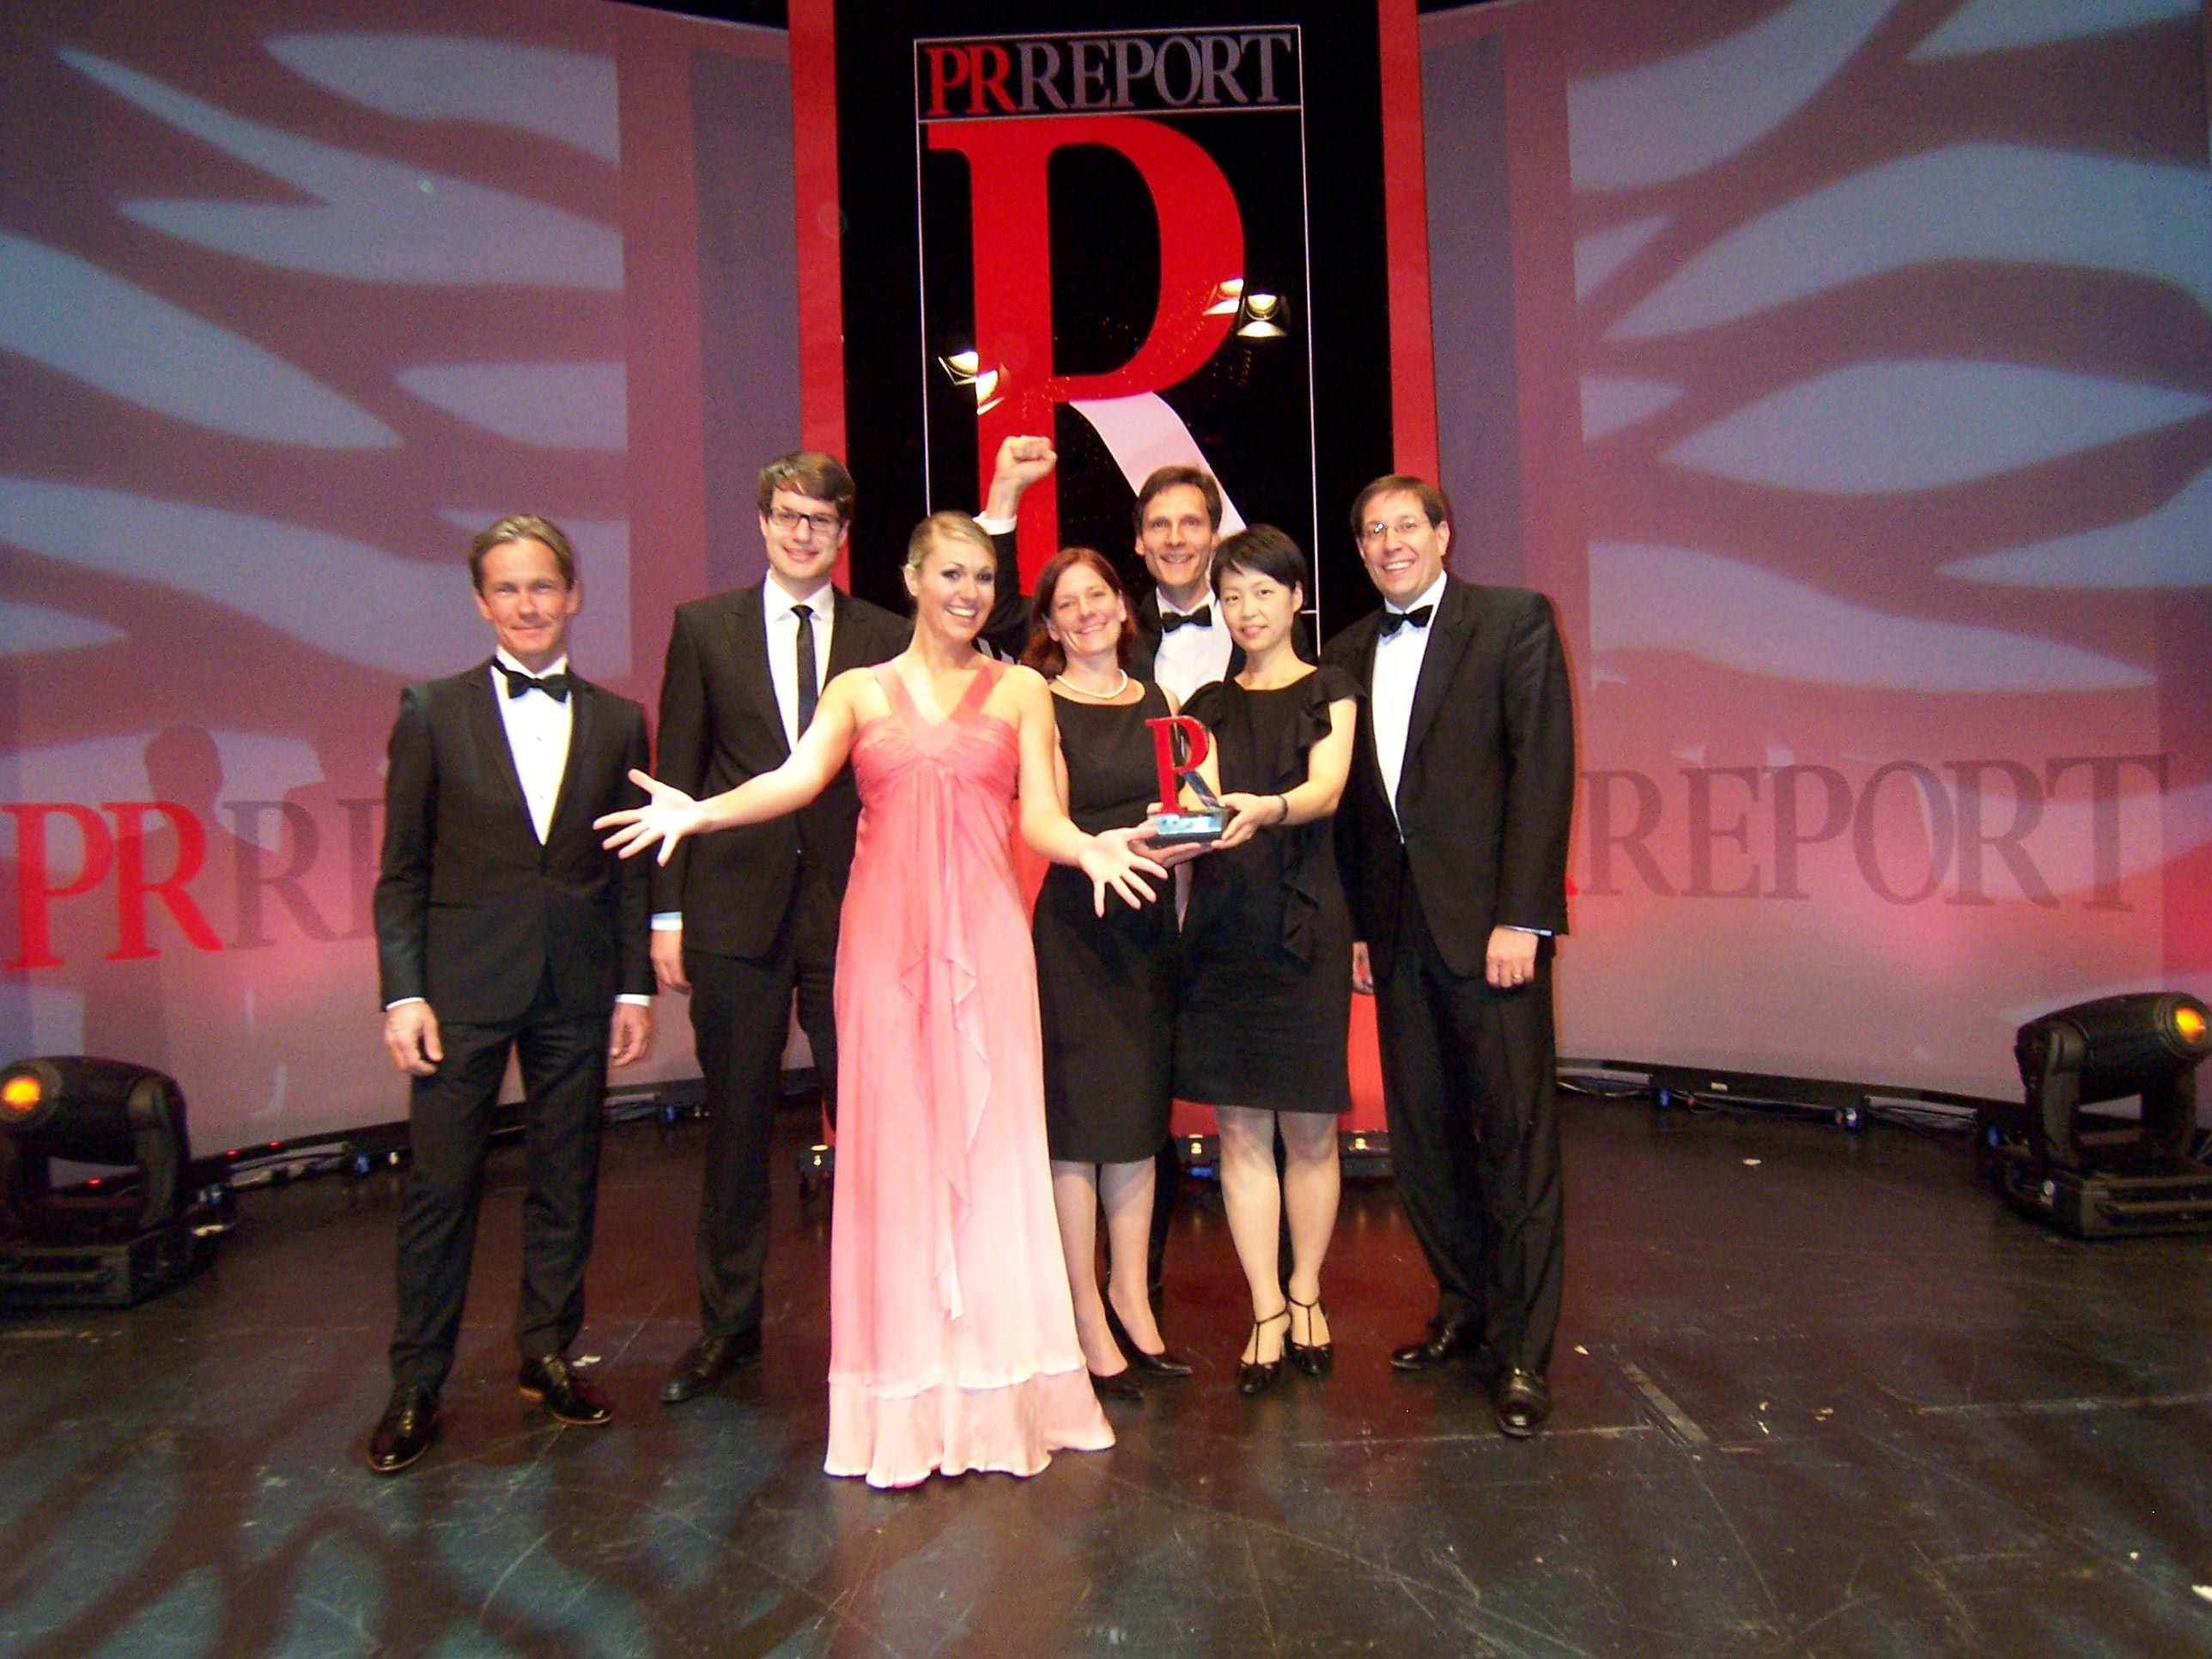 PR Report Award für den Amflora-Dialog